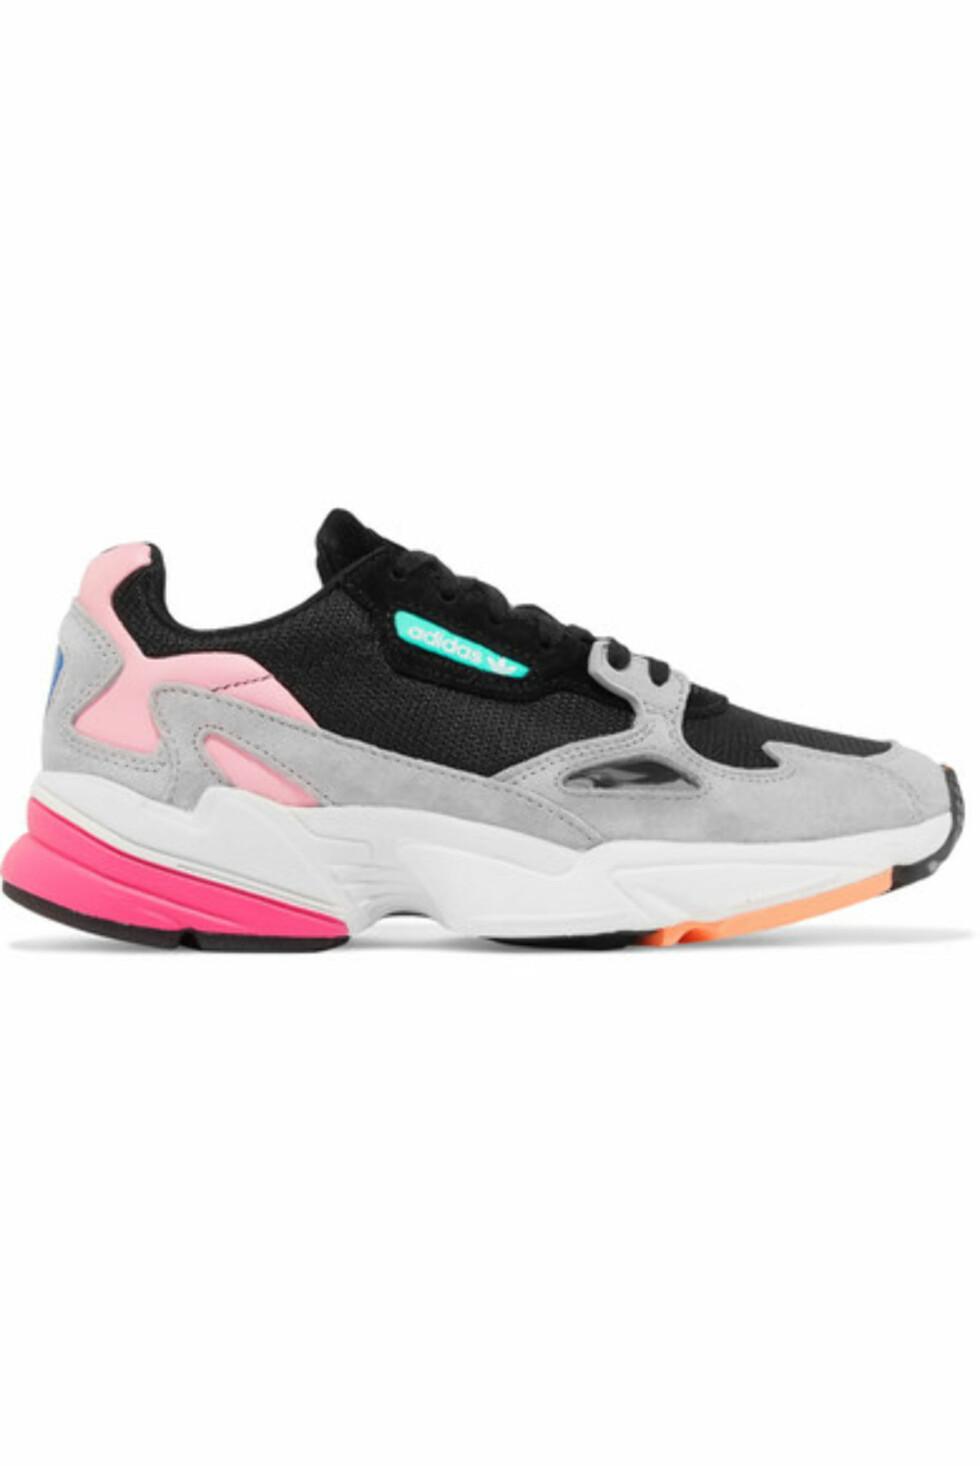 Sko fra Adidas |1000,-| https://www.net-a-porter.com/no/en/product/1050789/adidas_originals/falcon-mesh--suede-and-leather-sneakers